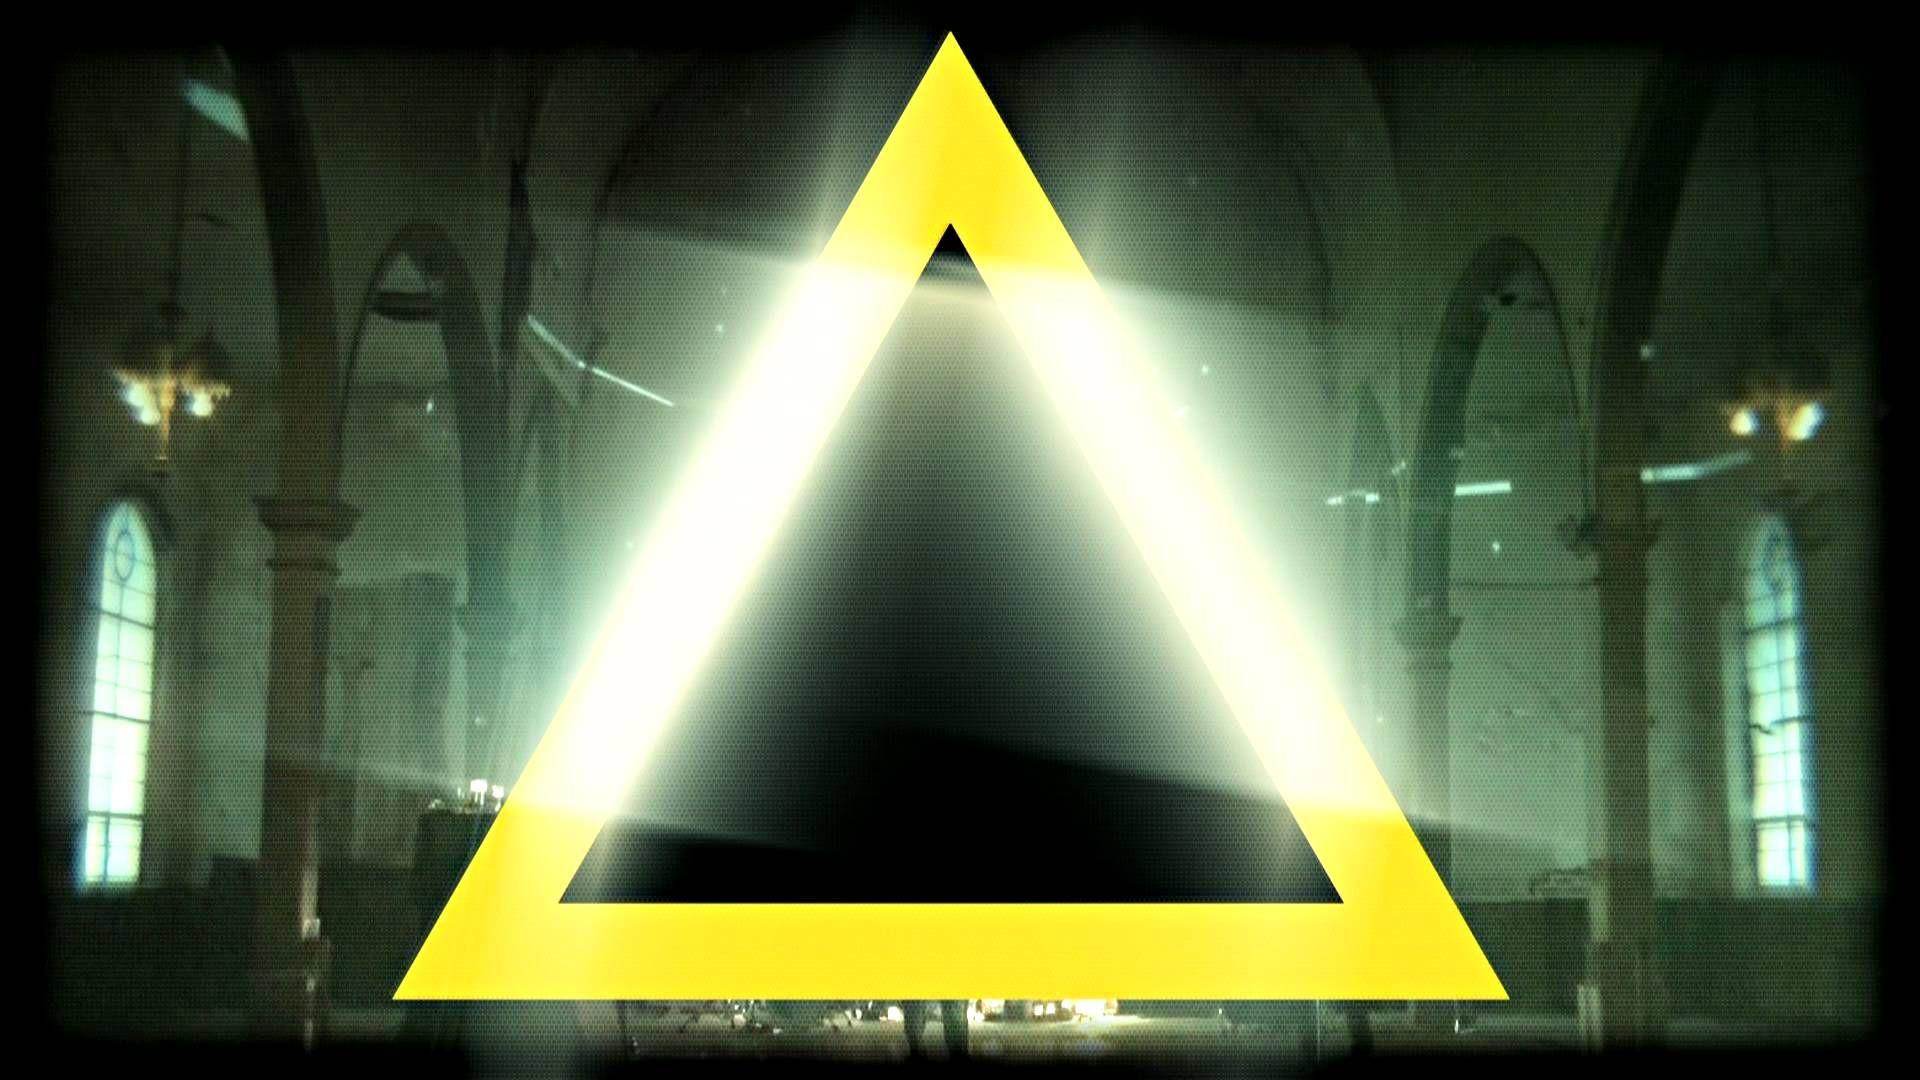 Depeche Mode - Heaven (Freemasons Club Mix / dj ro-land© Video Edit) 2013